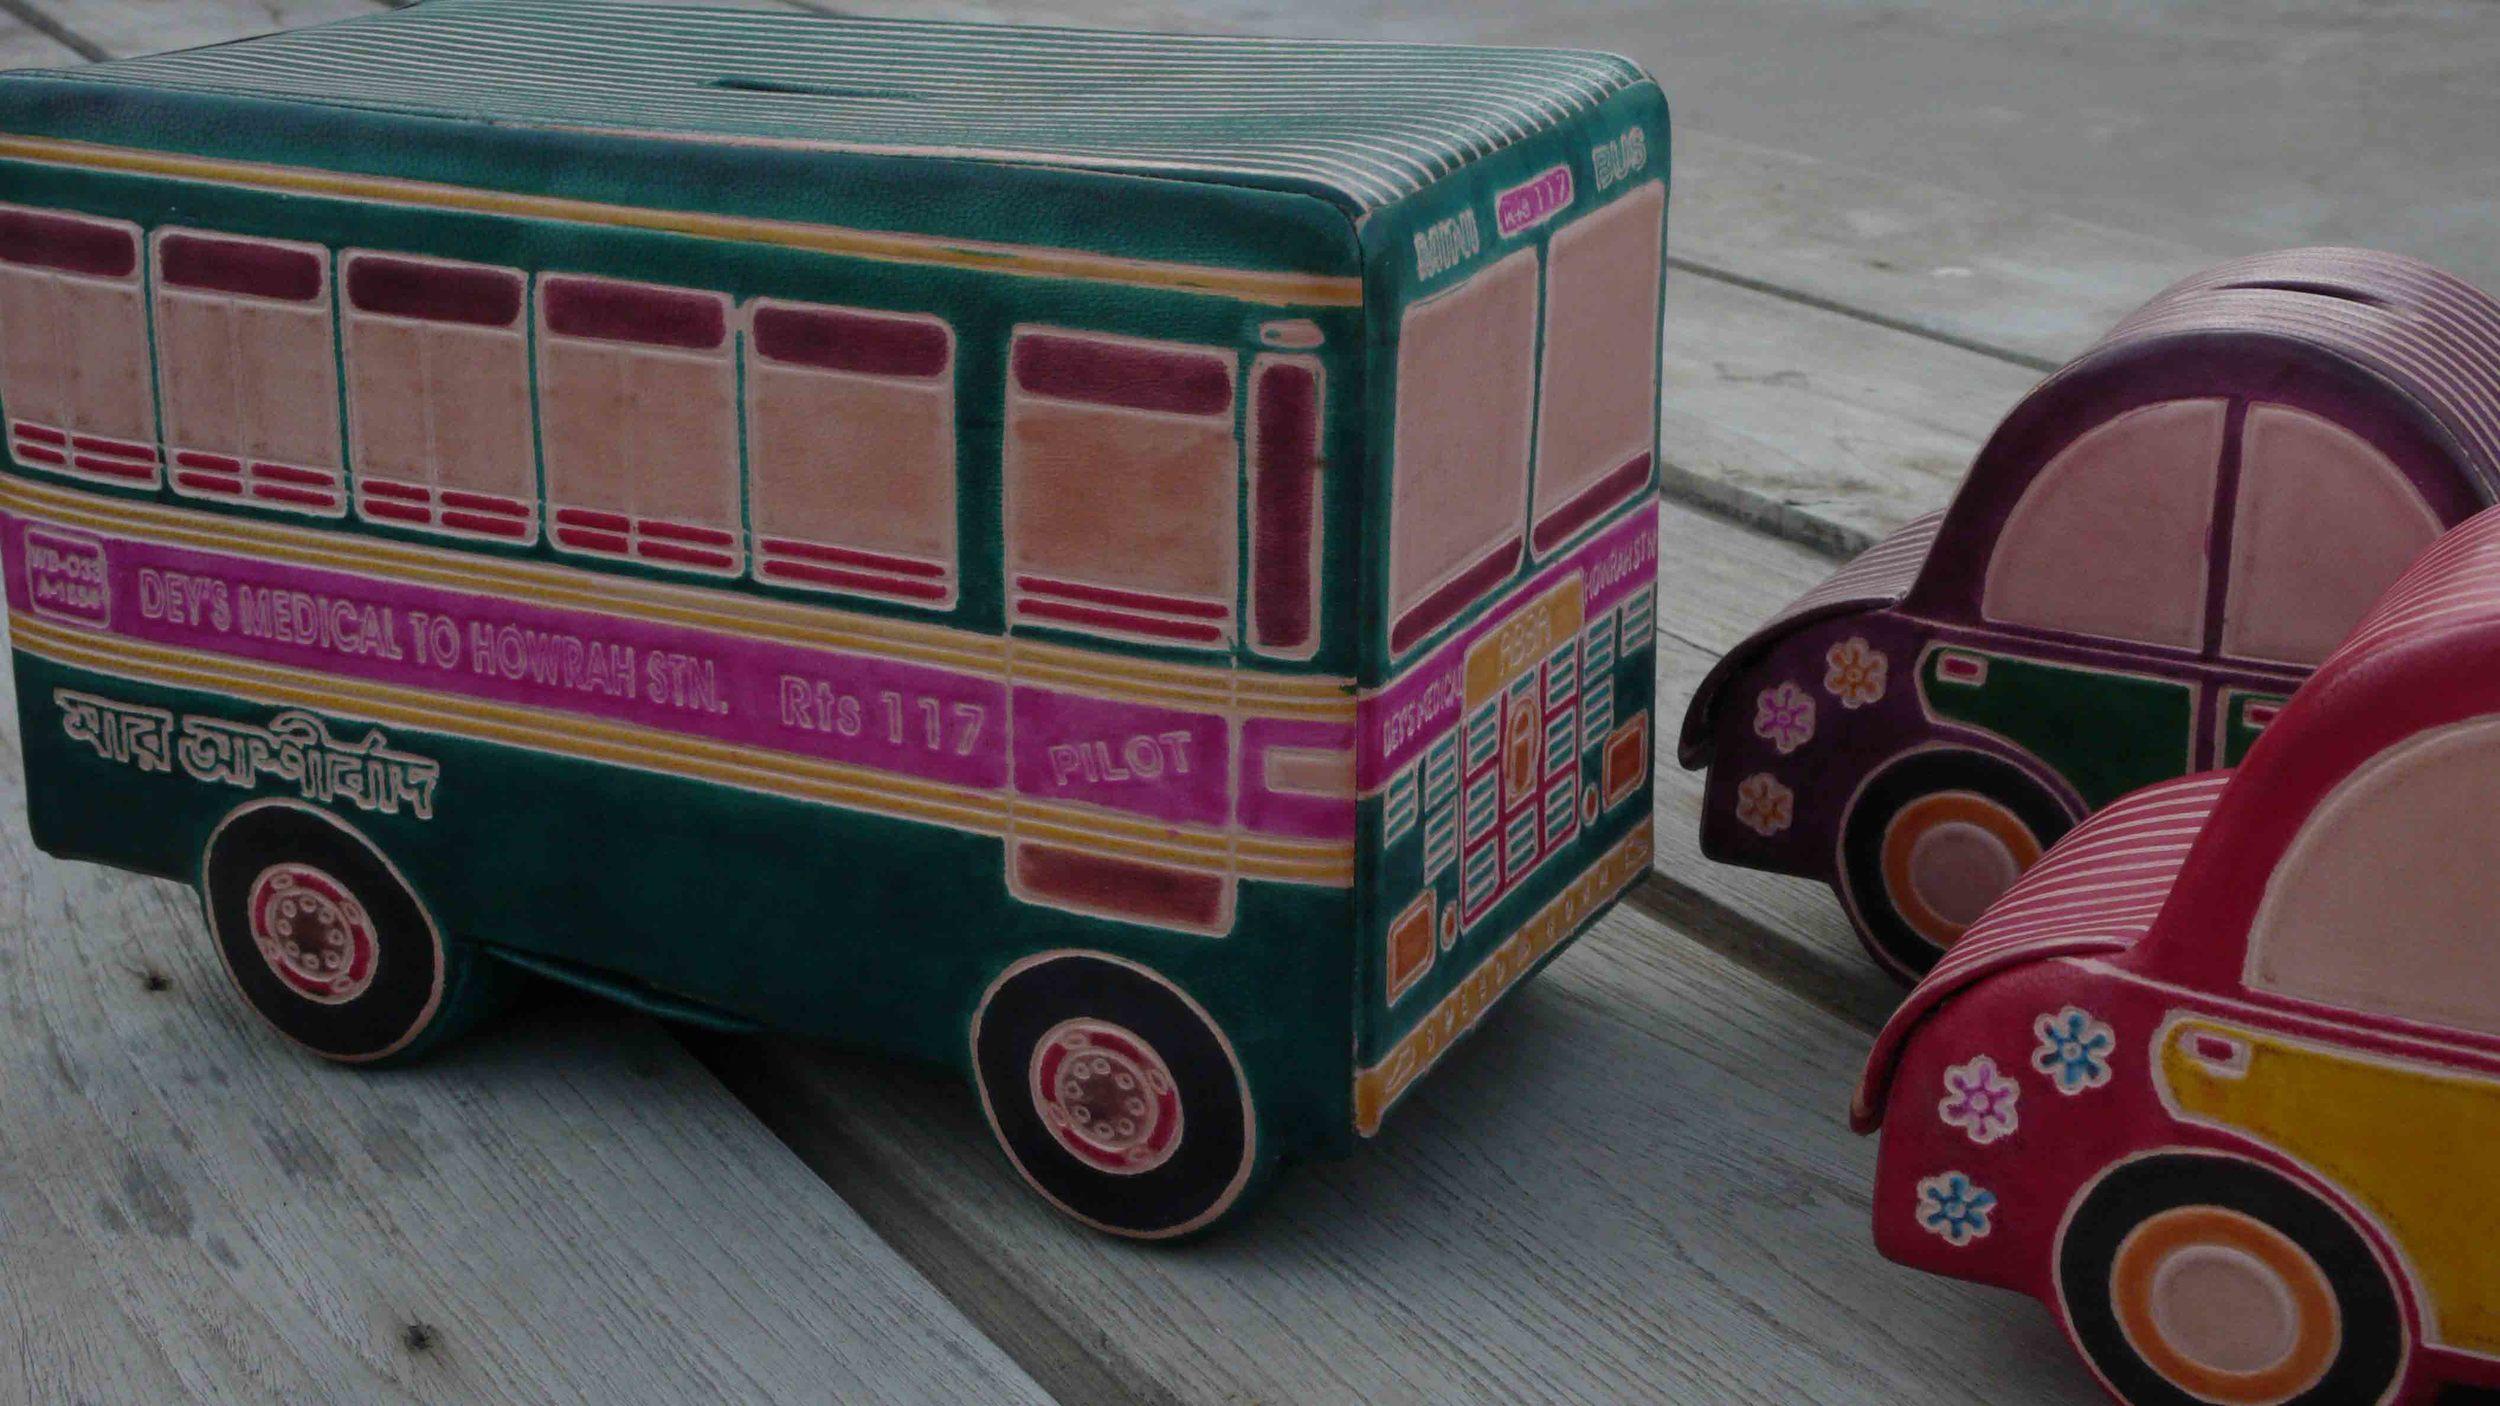 deys medical bus bank.jpg